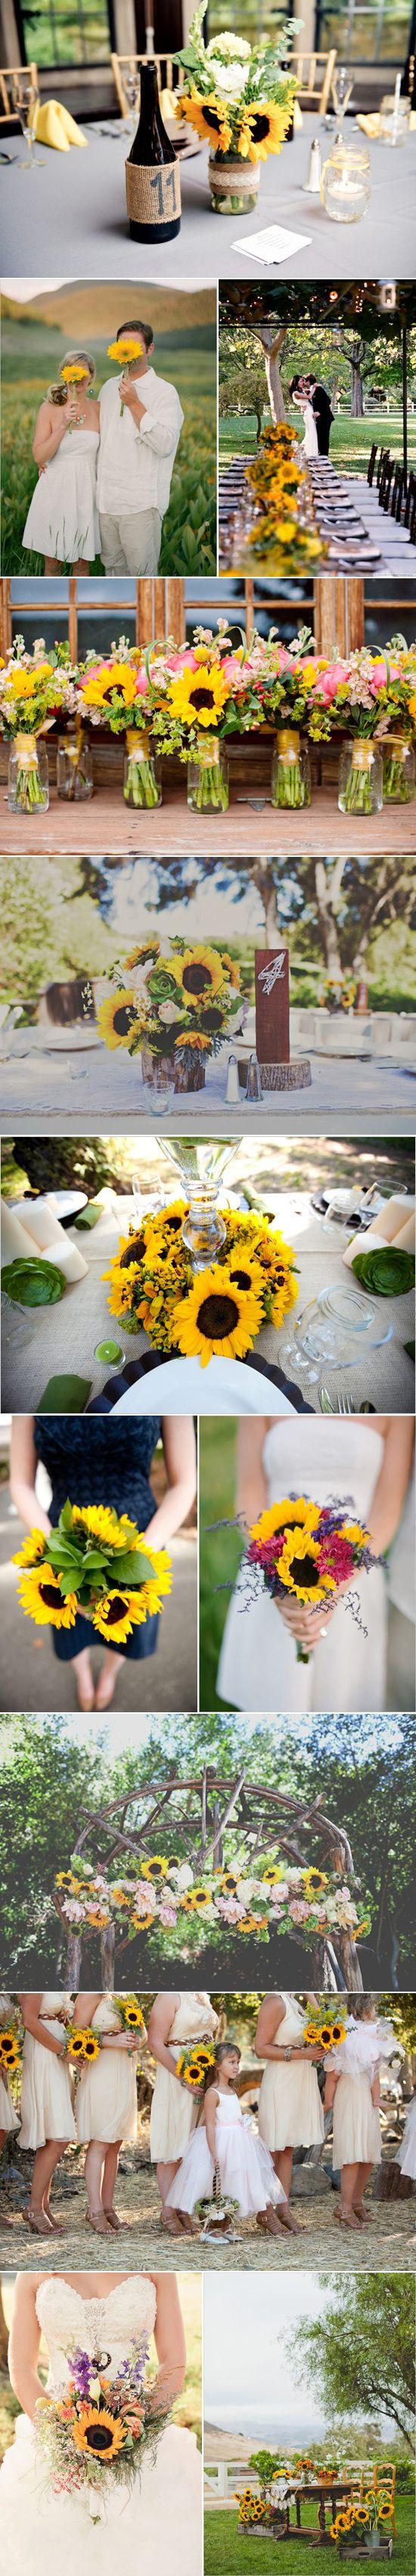 Sunflower Wedding Inspiration | Polka Dot Bride